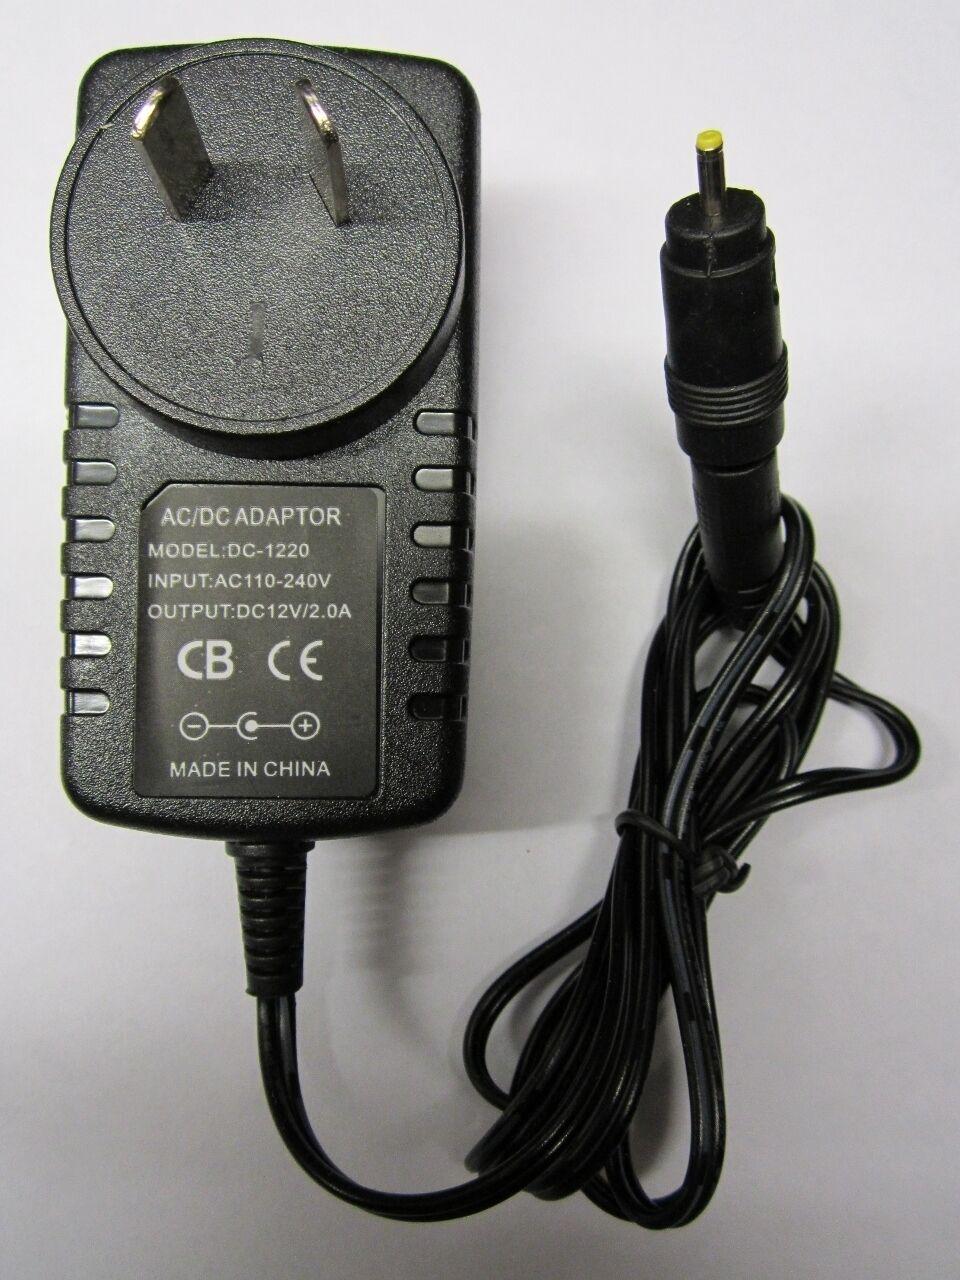 AUS 12V 2A Mains AC-DC Switching Adaptor Power Supply 2.5mmx0.8mm 2.5x0.8 Plug